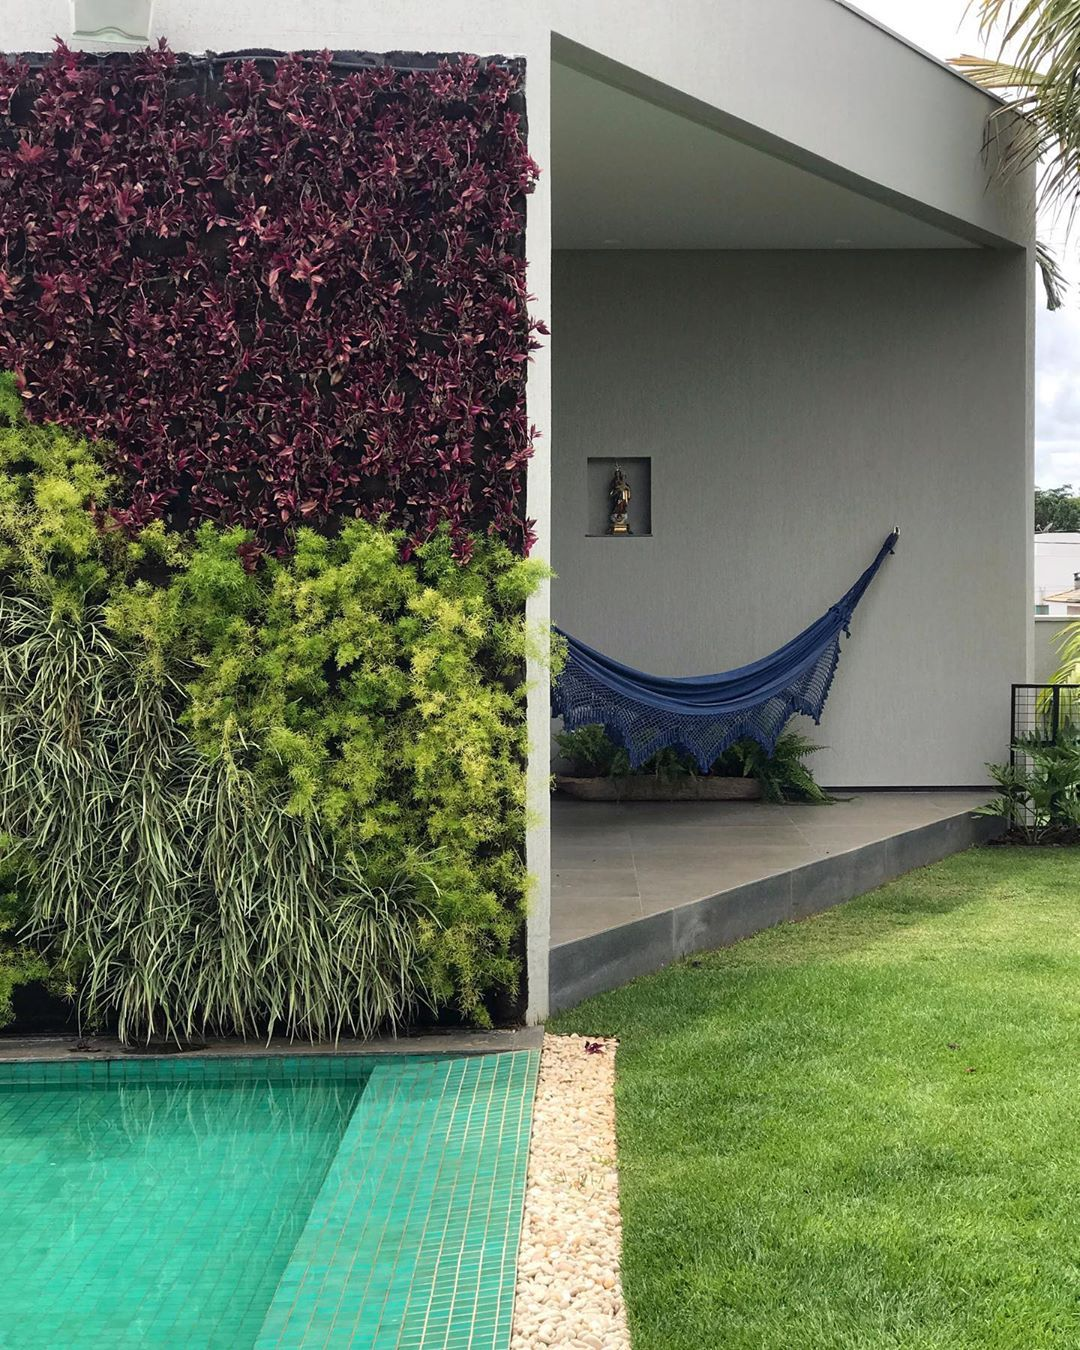 230 House Swimming Pool Ideas Pool Swimming Pools Pool Designs